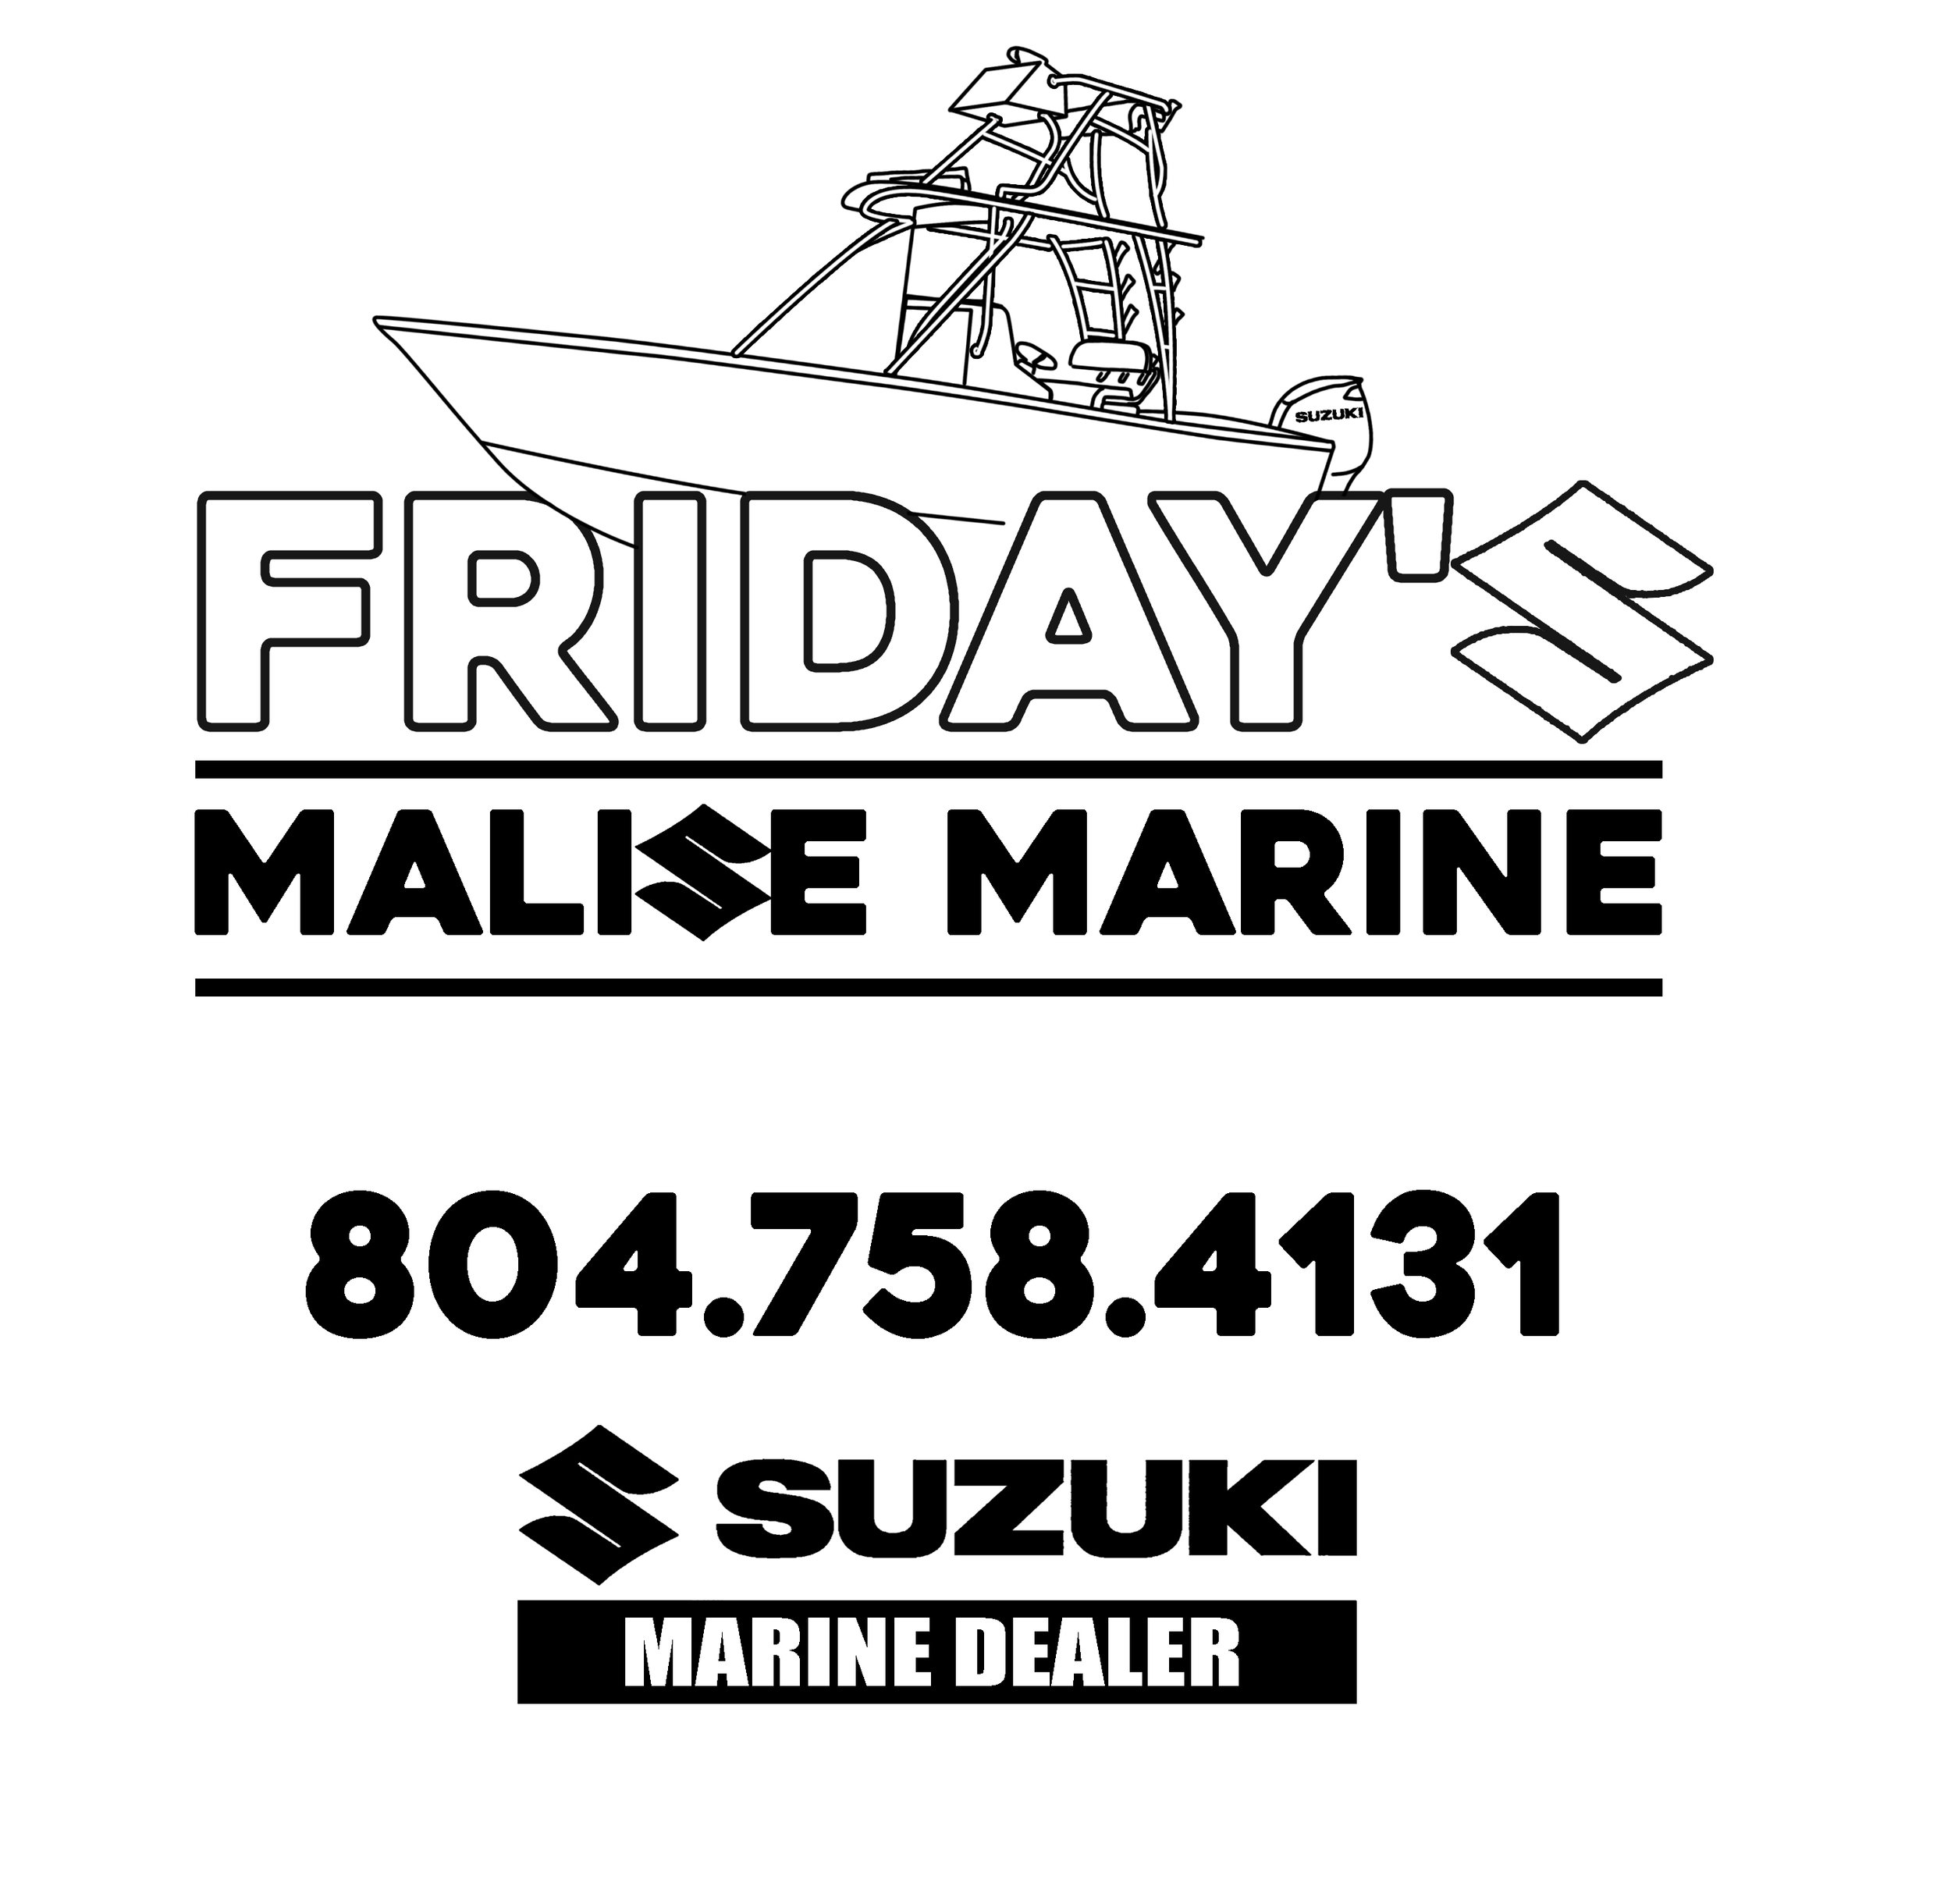 Fridays marine logo concept.jpg